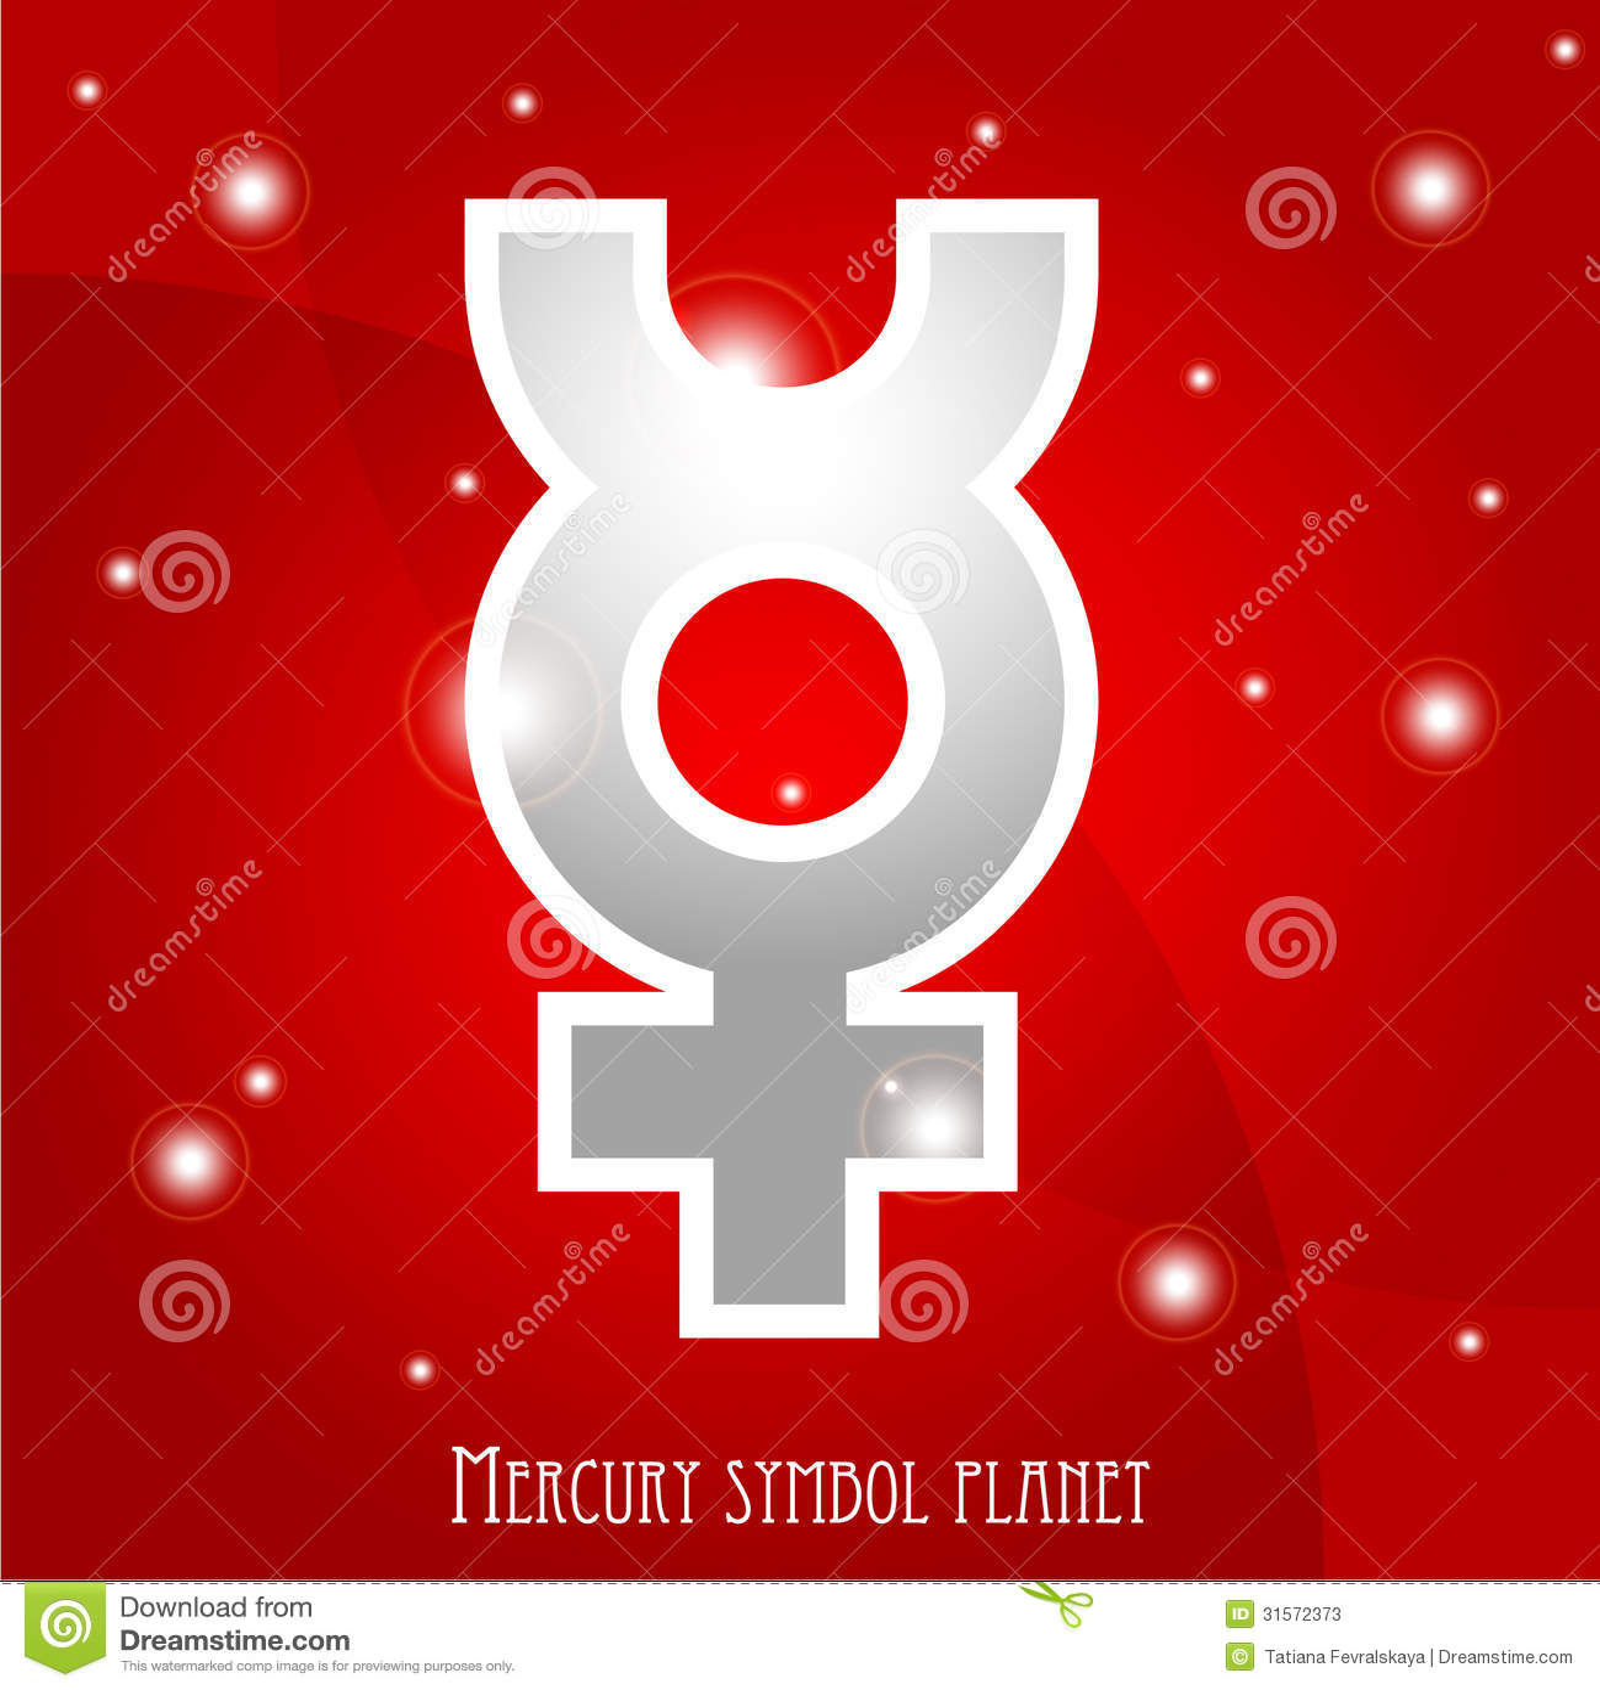 Symbol Of Mercury Planet Stock Illustration Illustration Of